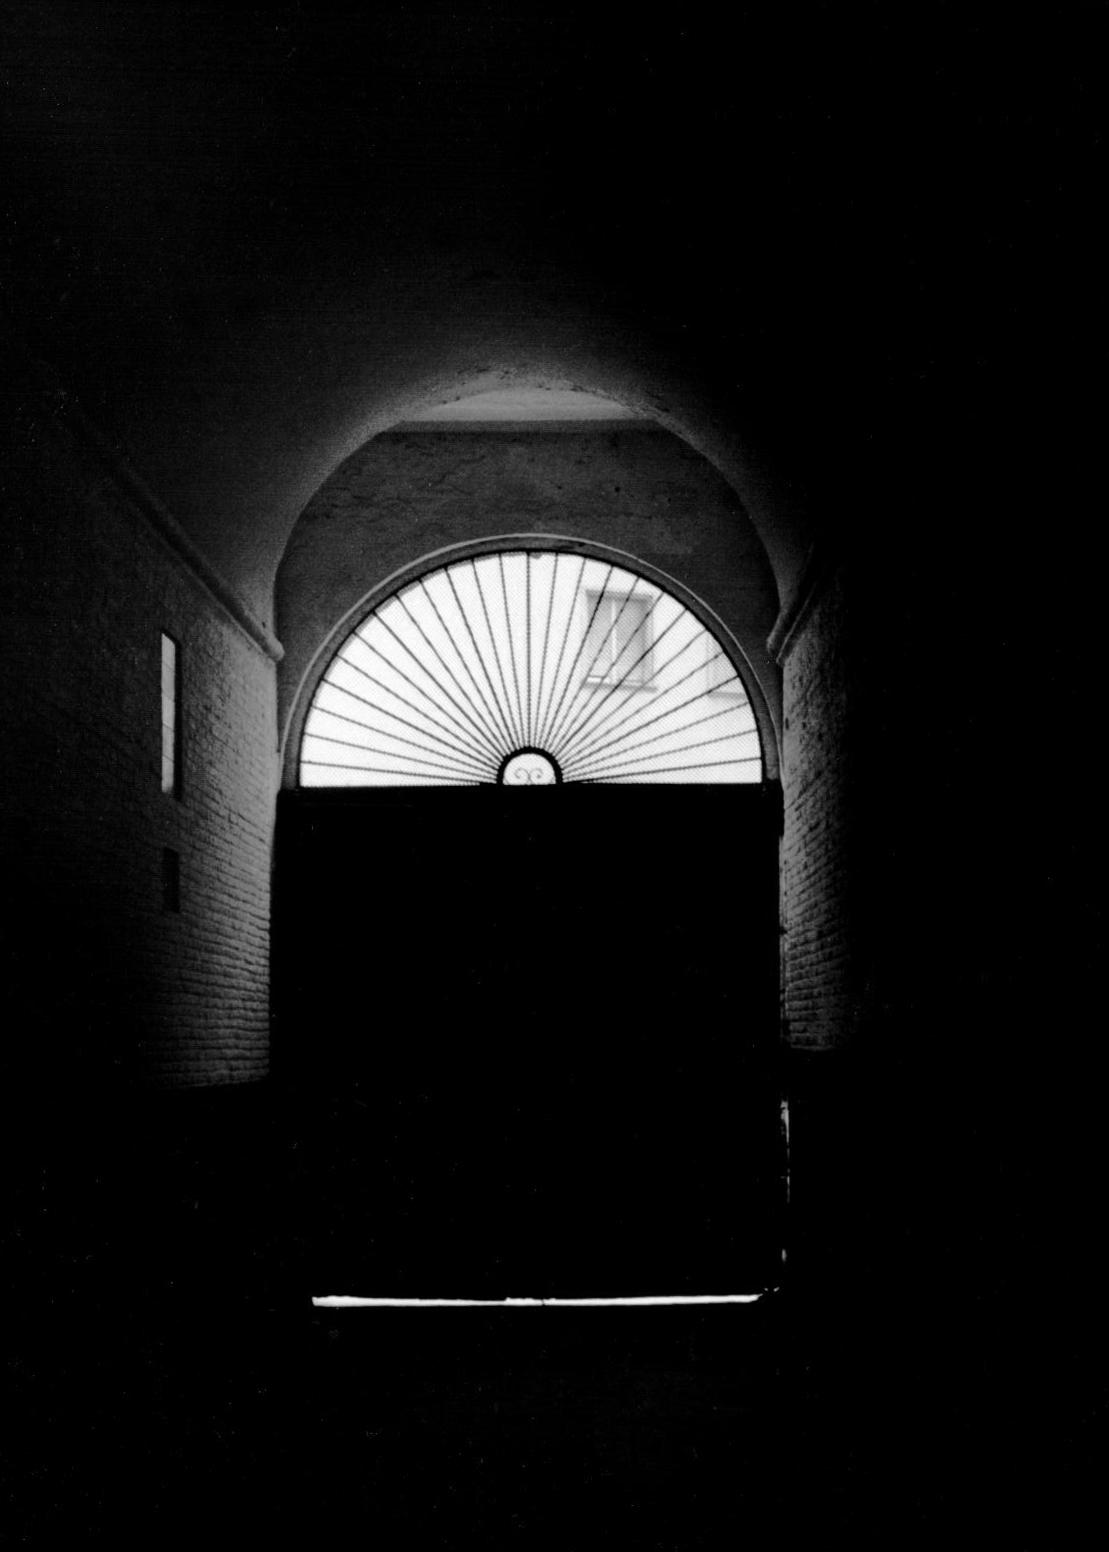 Doorway, Plaza de Toros. Sevilla